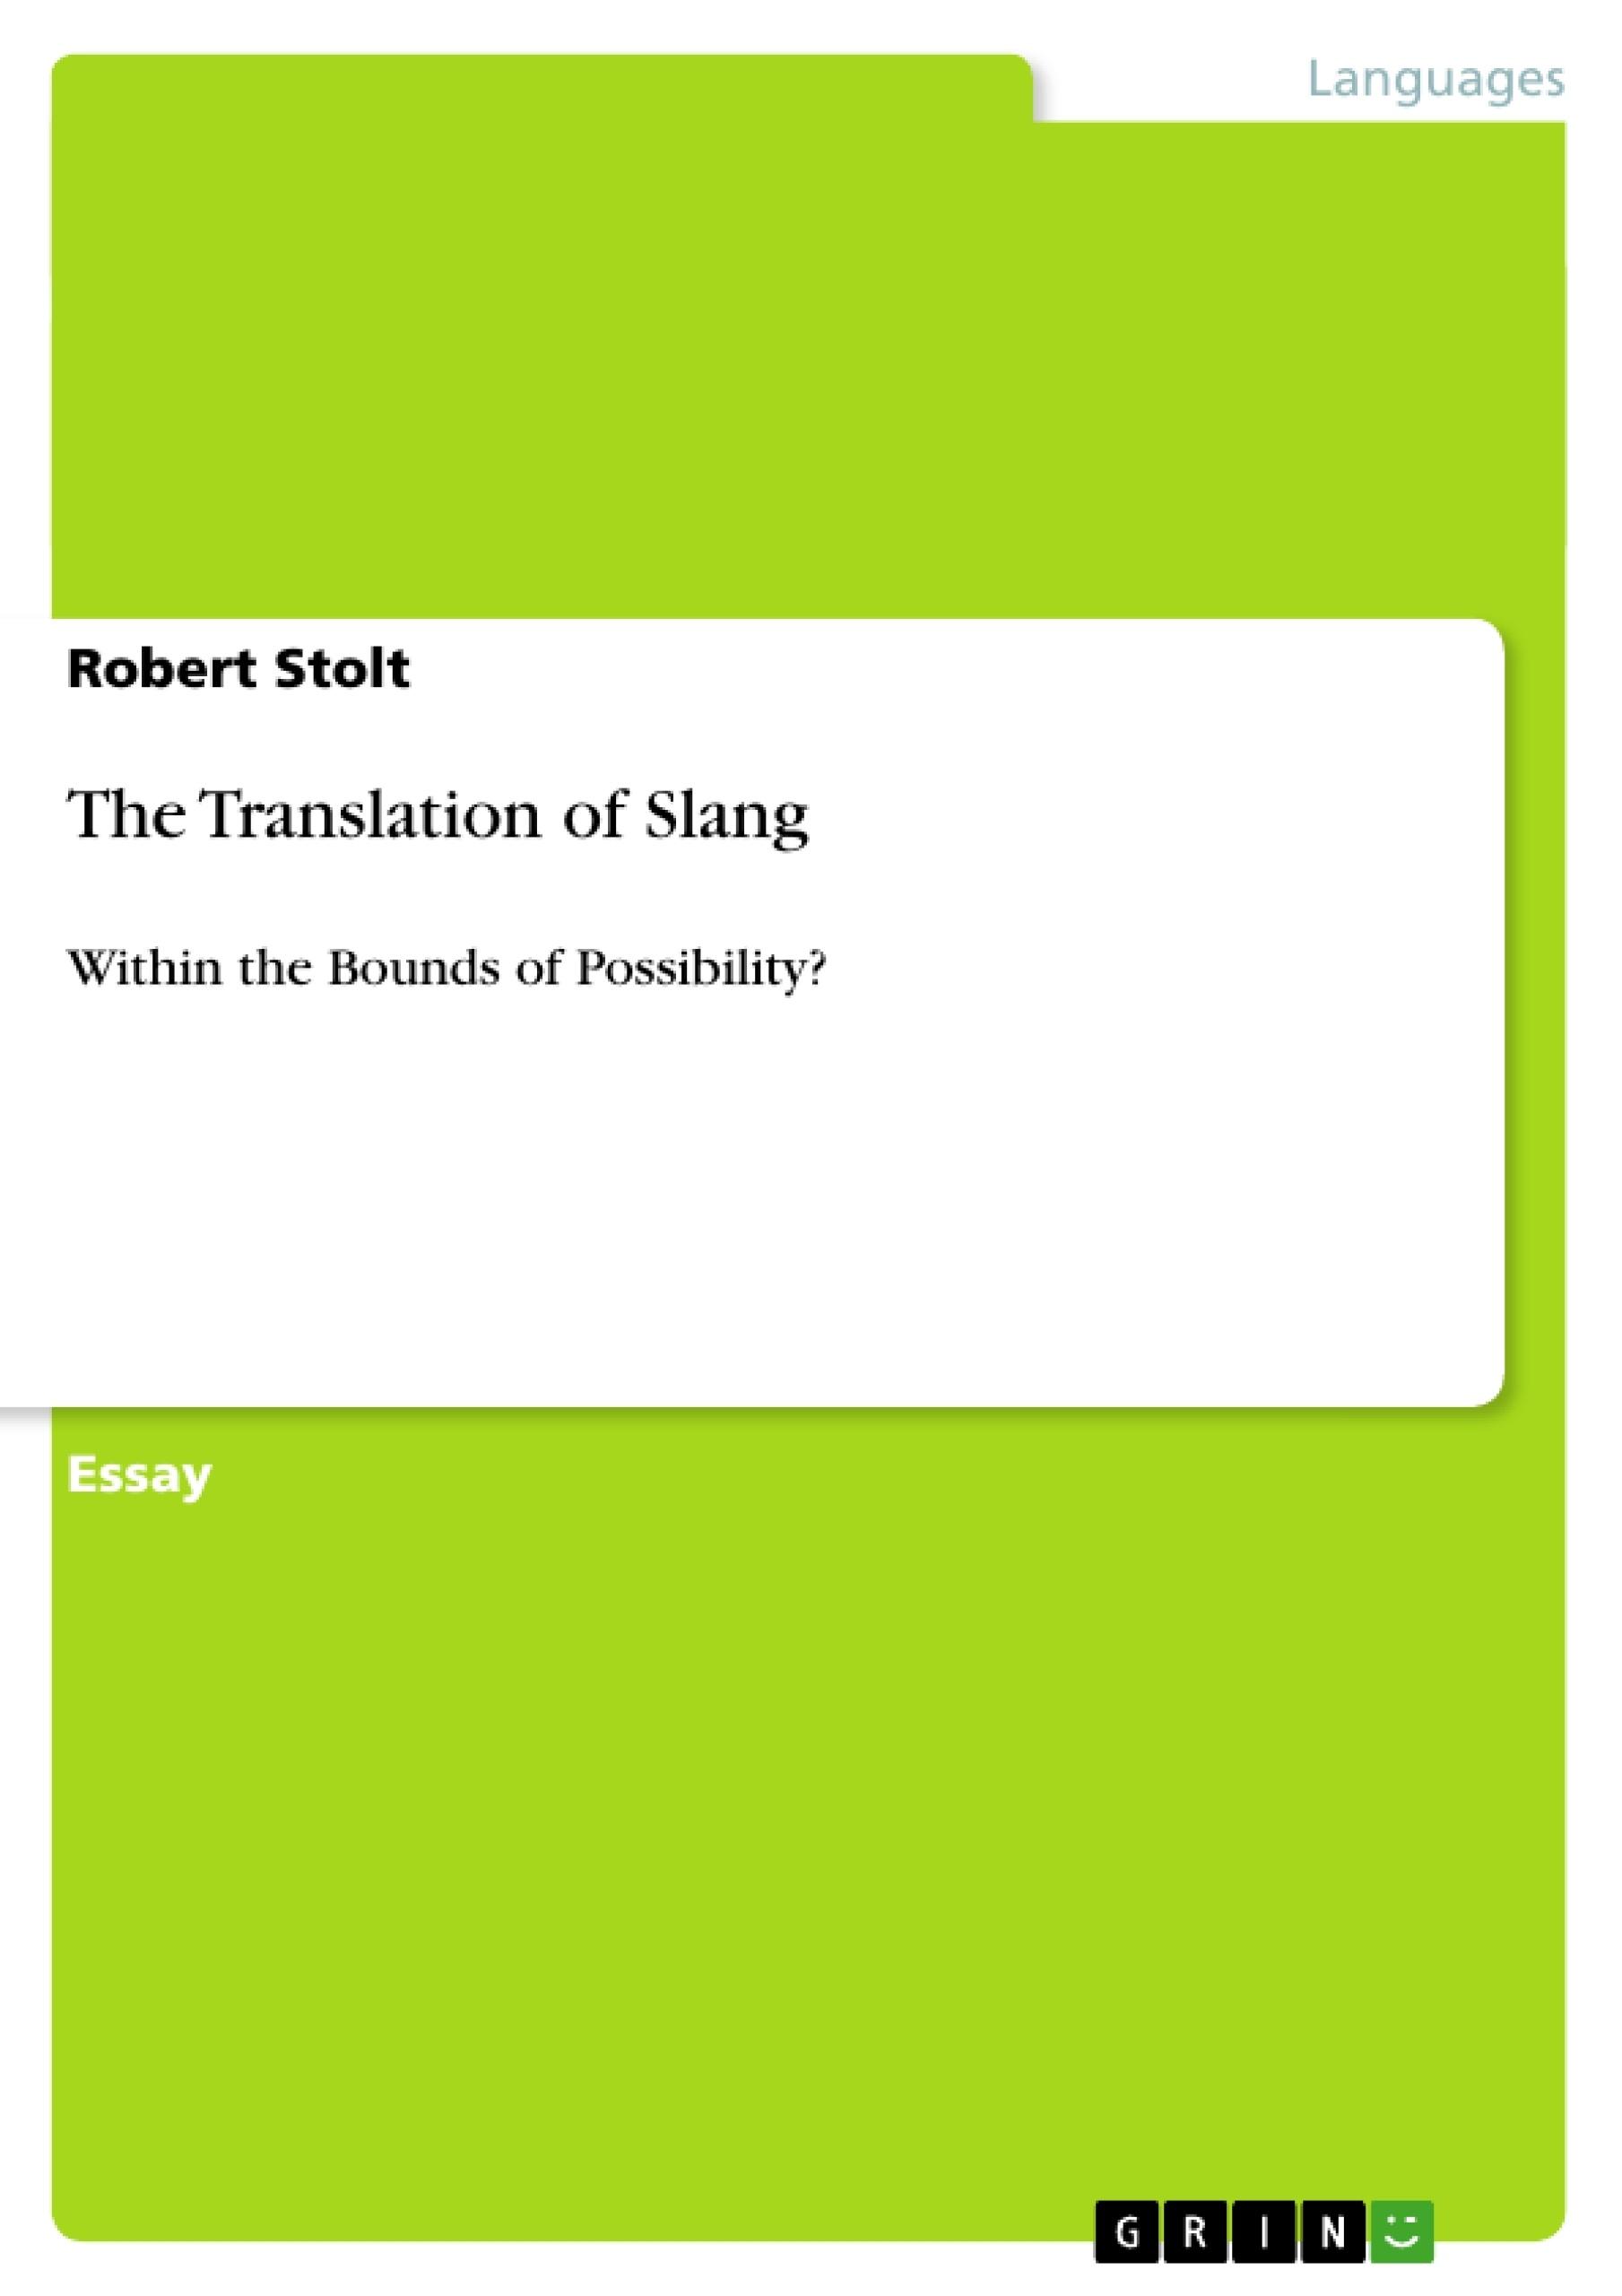 essay about slang